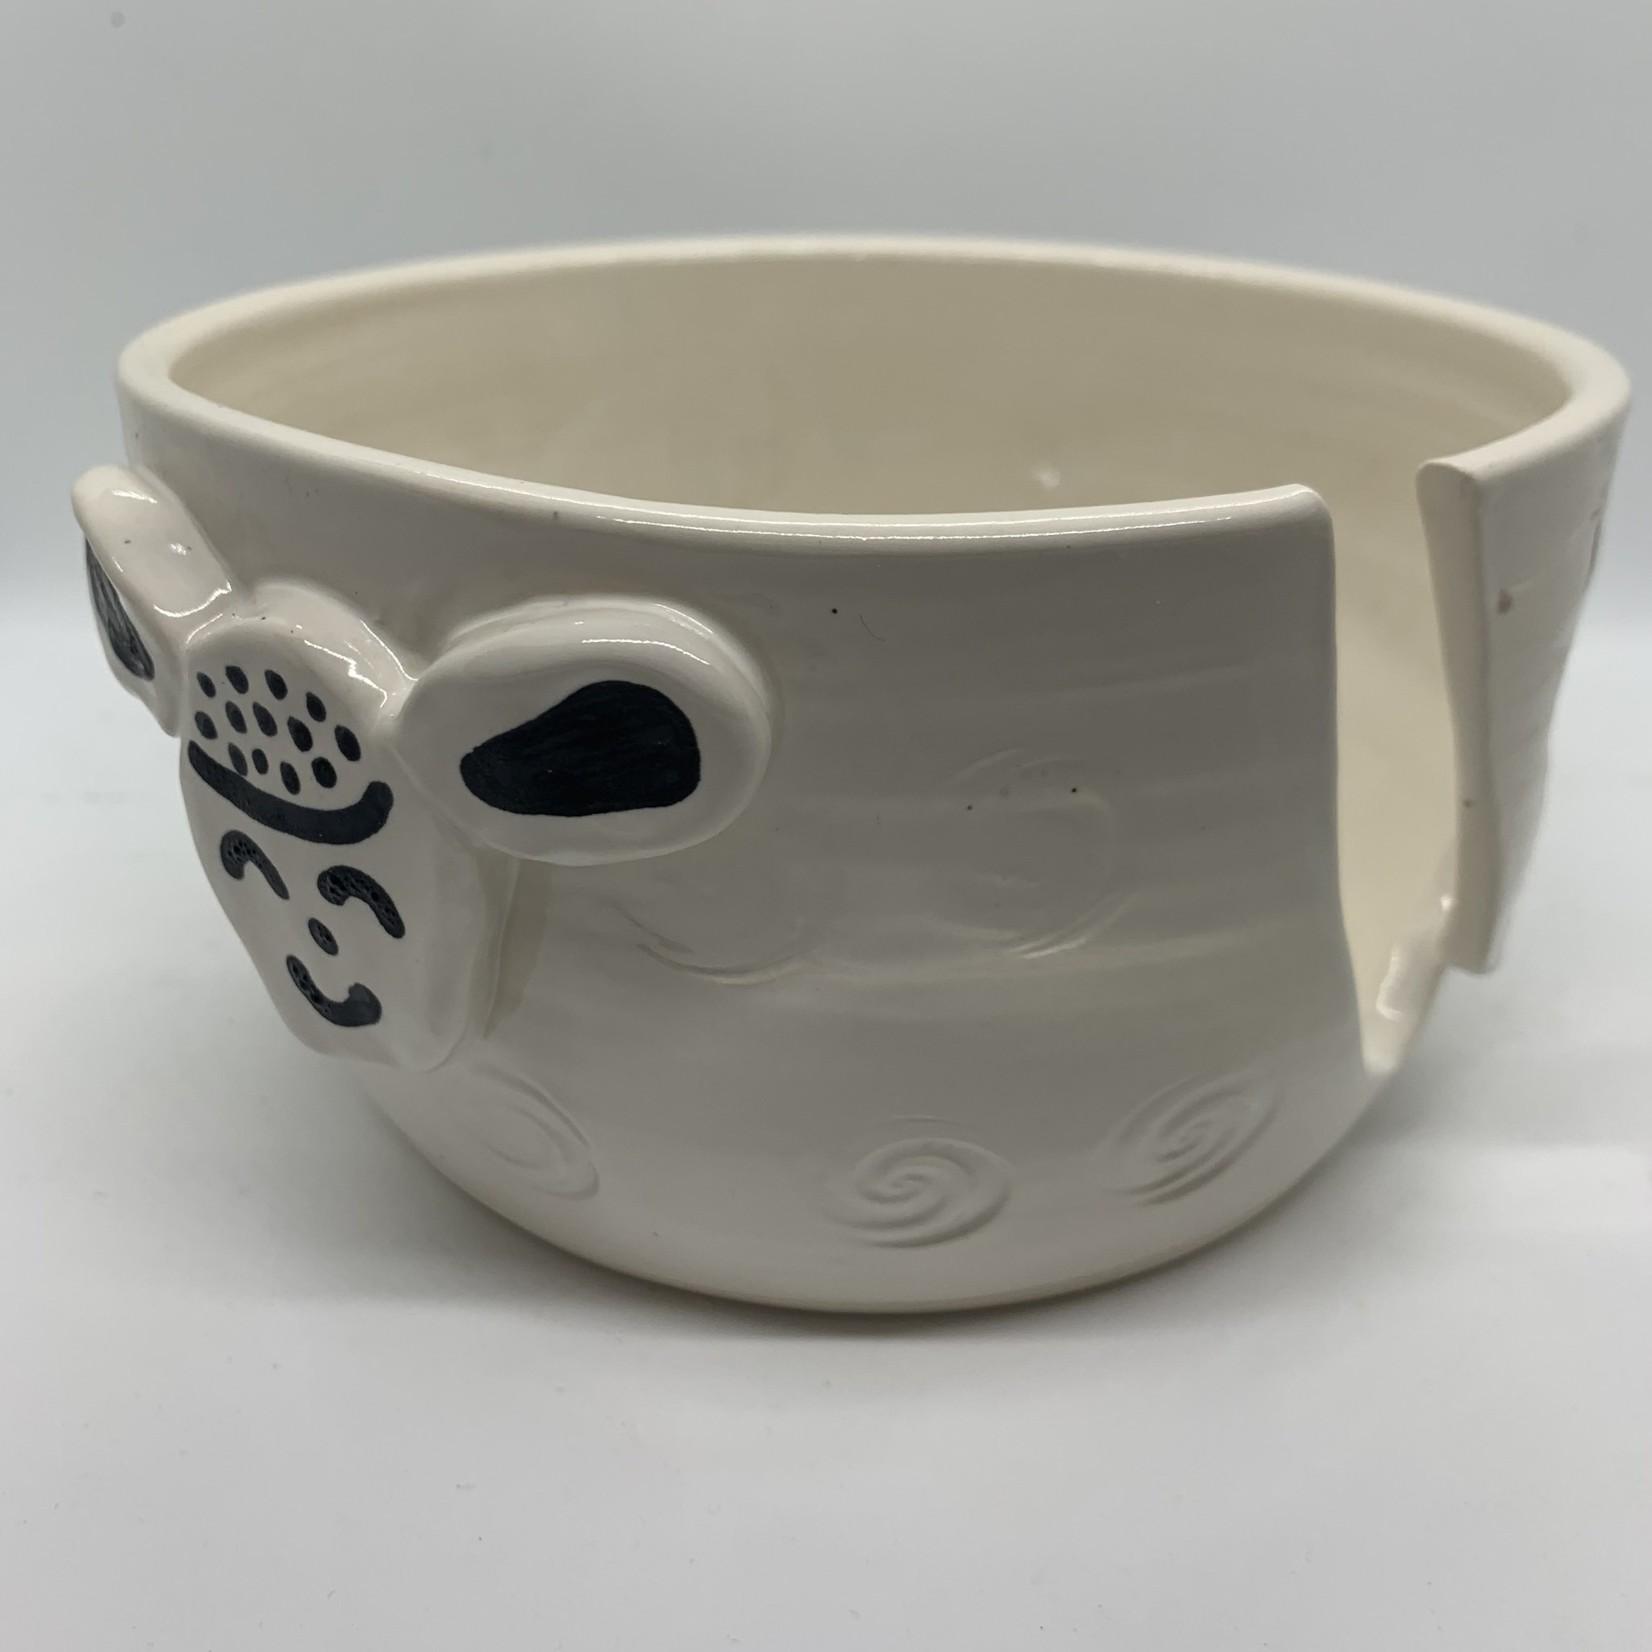 Shelley's Artistry Co Yarn Bowls